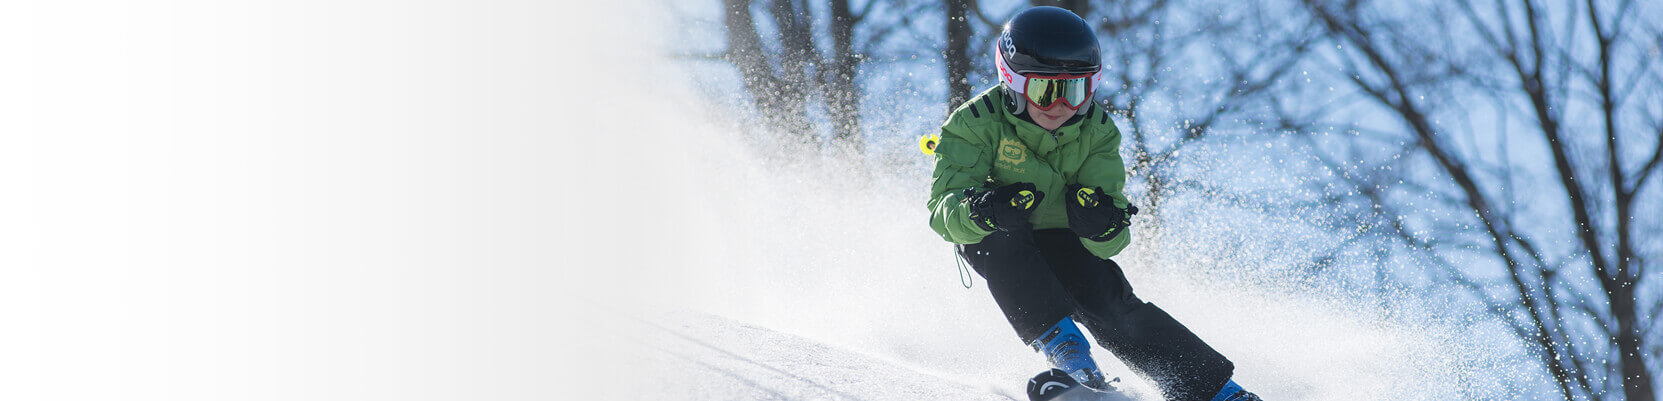 Skier making their way downhill